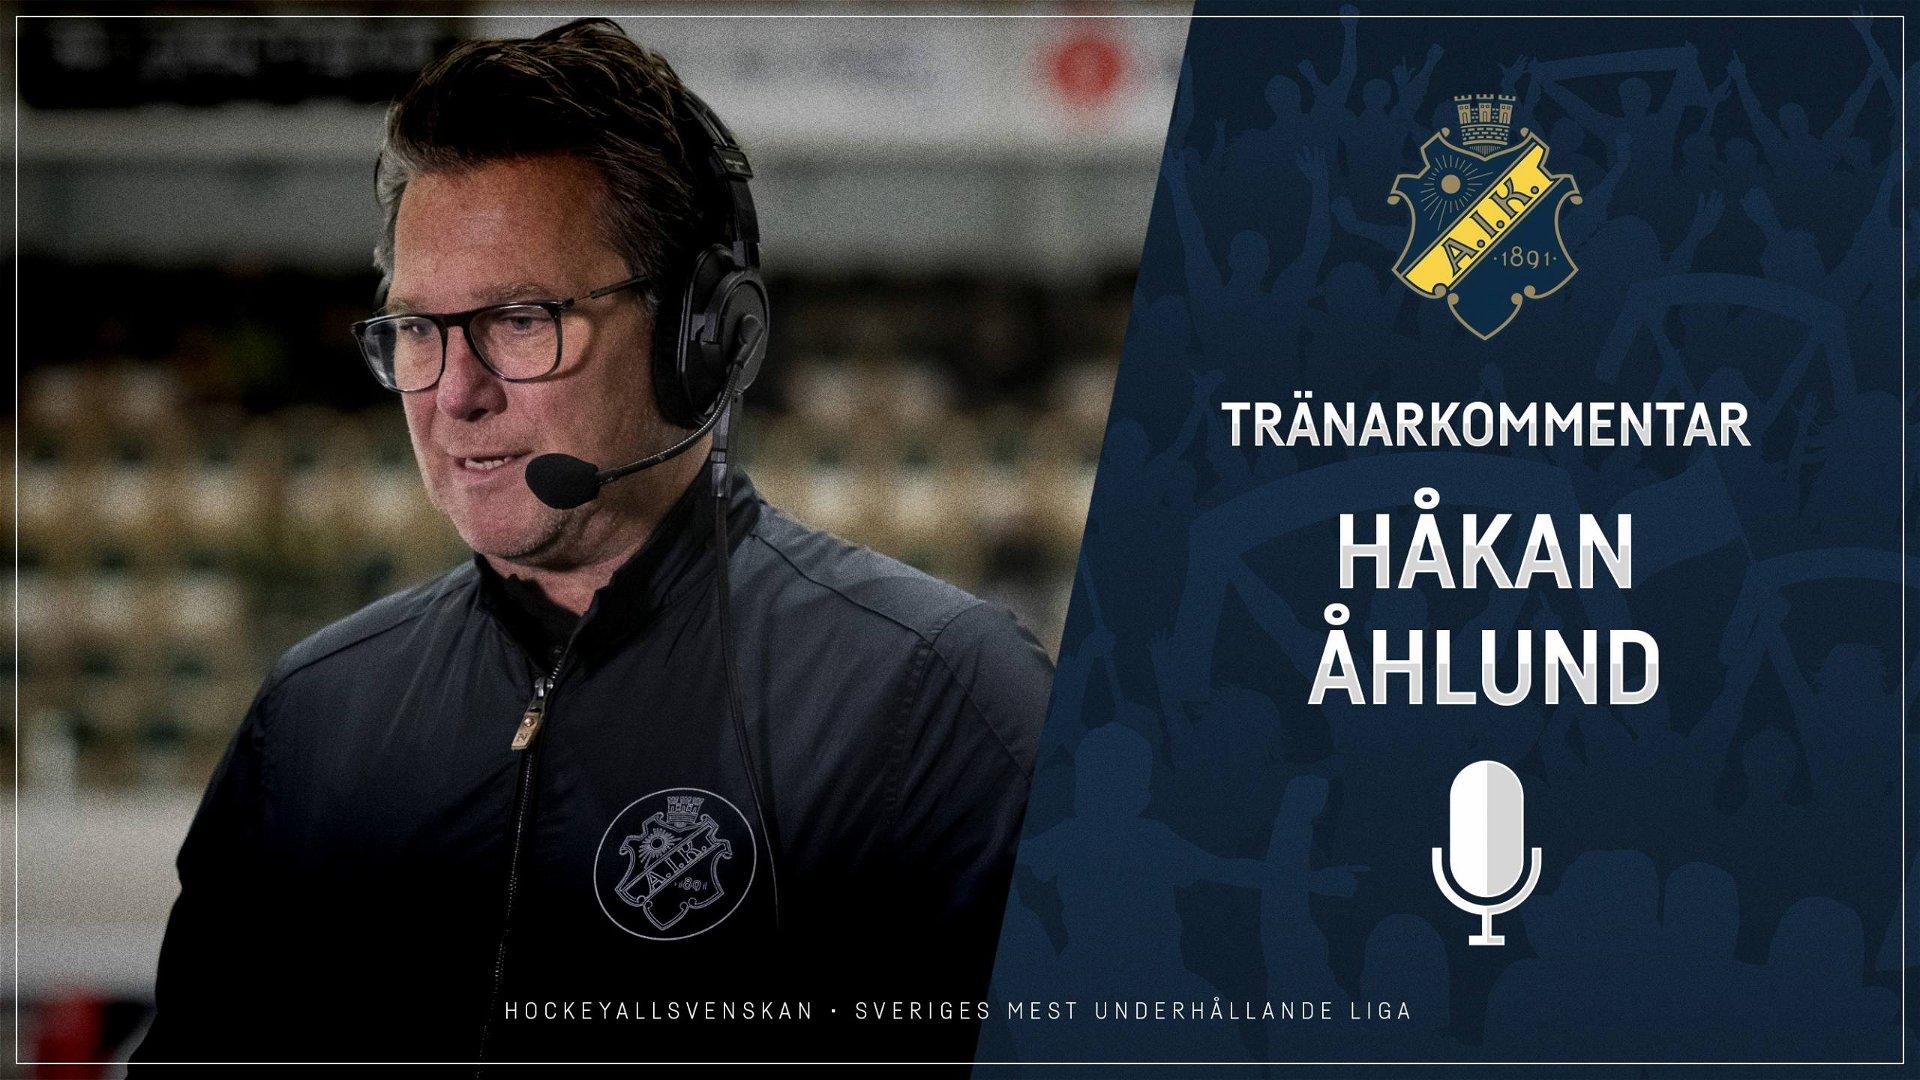 2020-10-30 Segerintervju: Håkan Åhlund